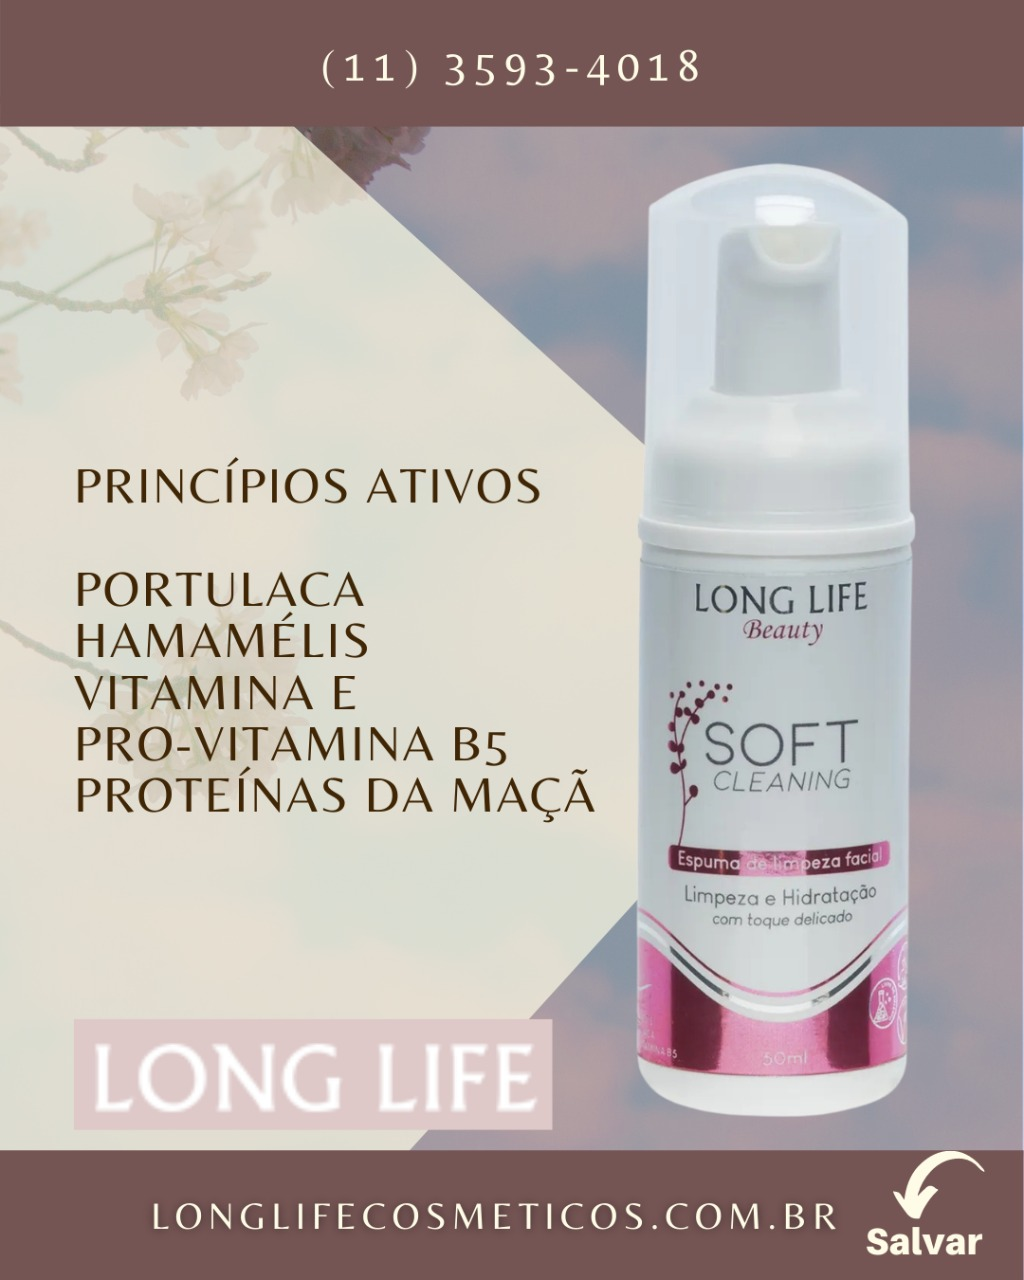 KIT 1 Cx Creme Pós Micropigmentação Long life Beauty (20 unids). + 1 Sabonete Soft Cleaning 50 ml para limpeza facial